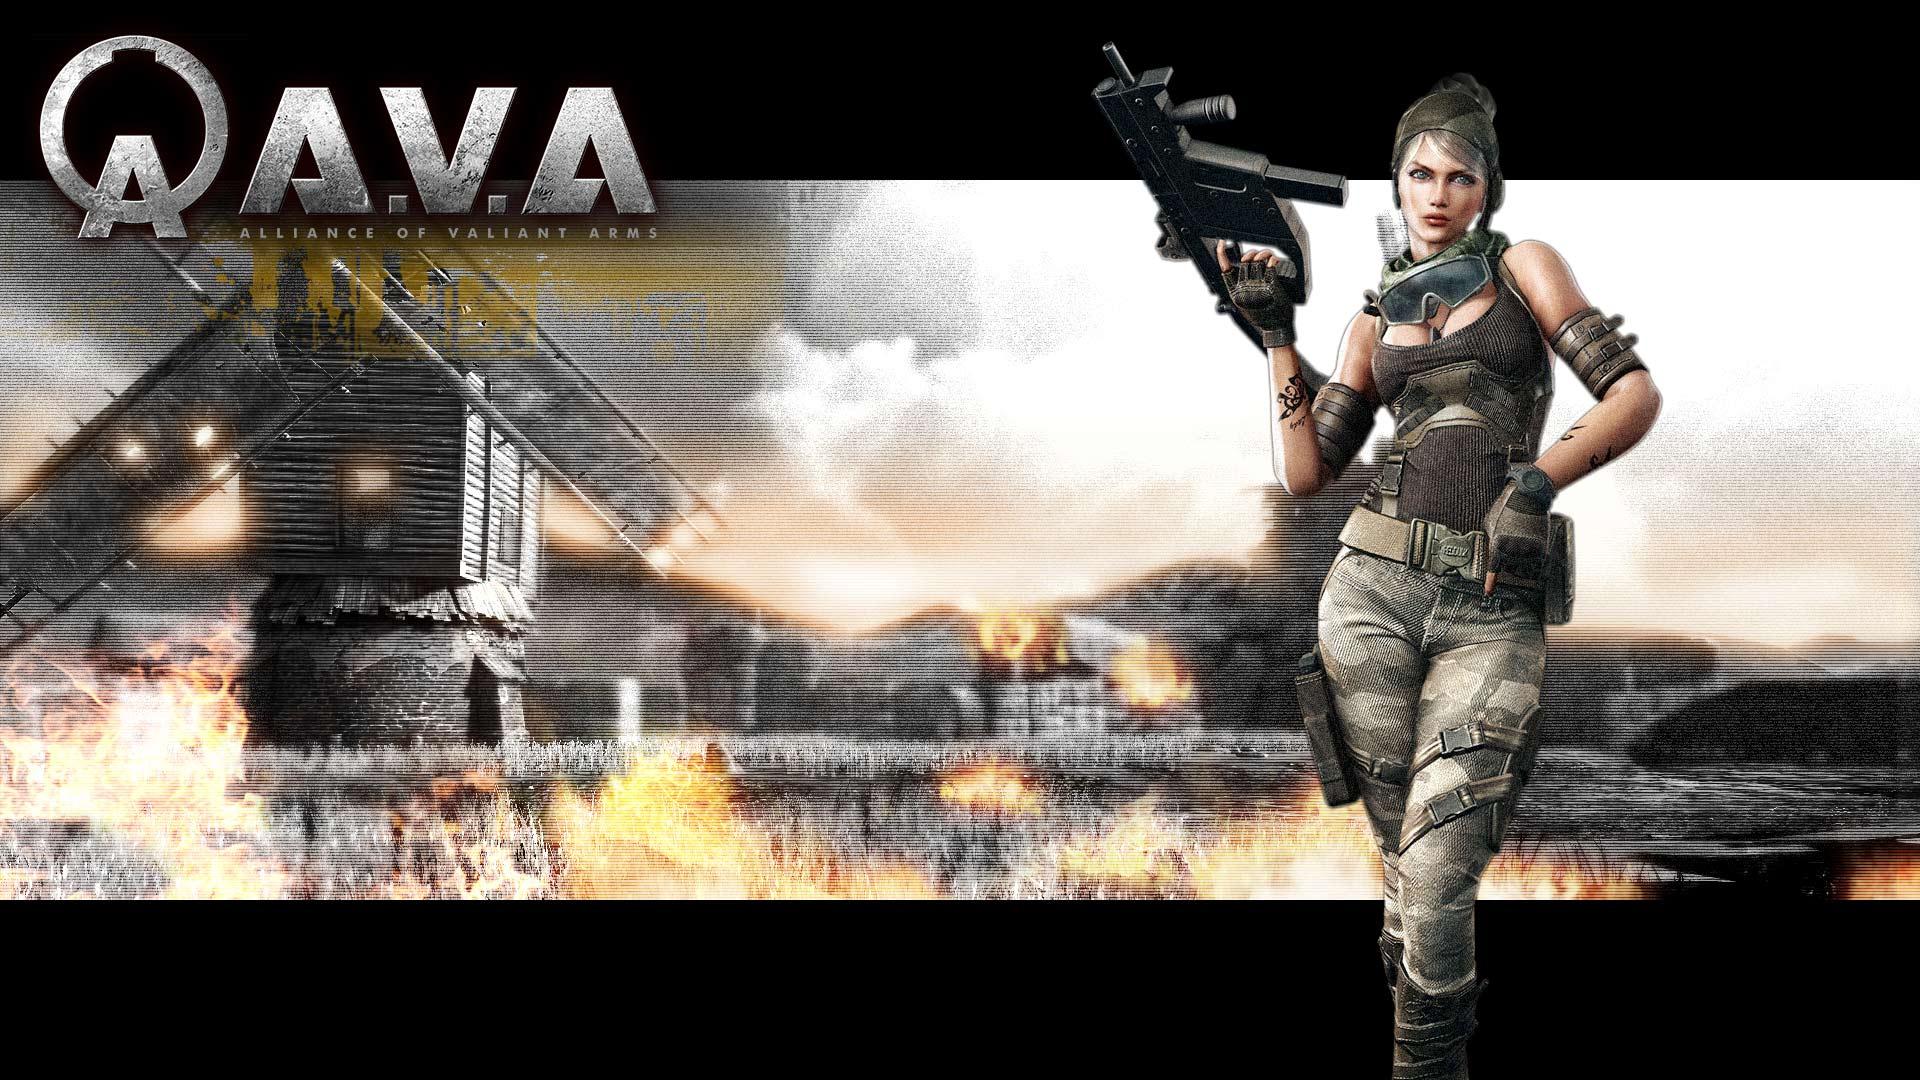 AVA Alliance of Valiant Arms Artwork 4.jpg